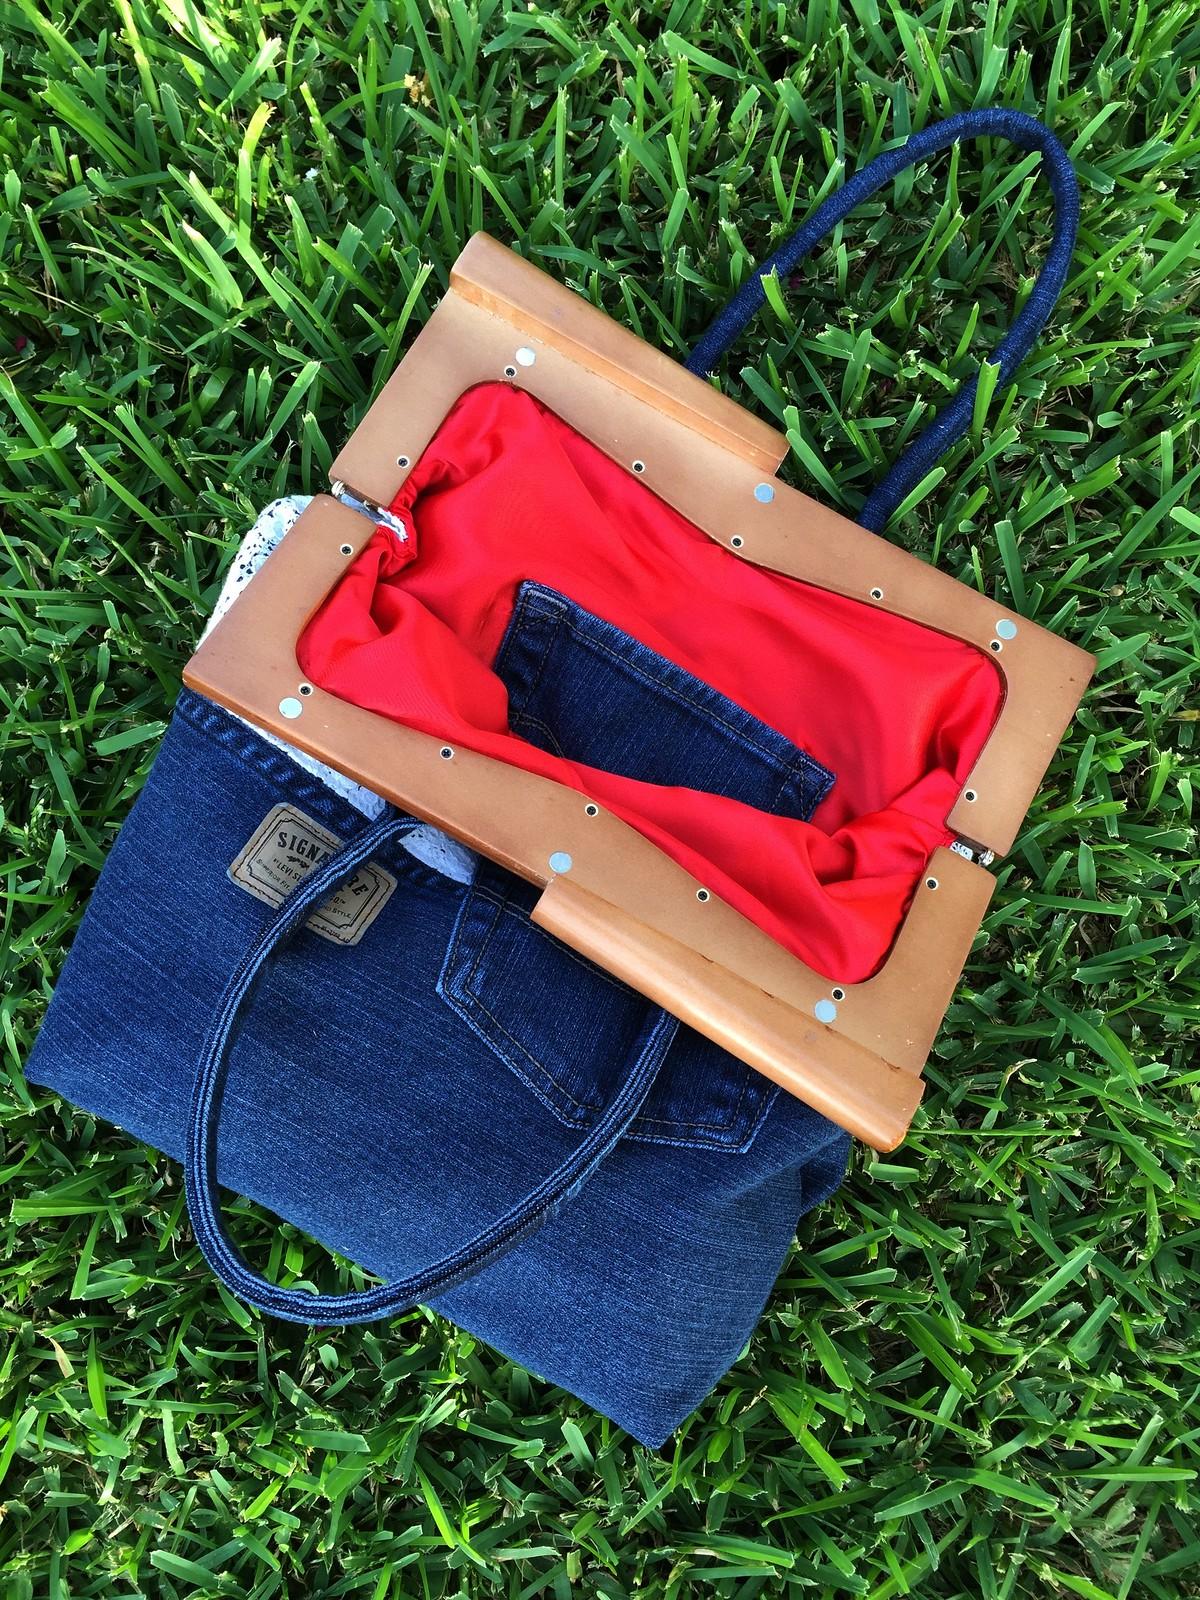 Americana Bag - After